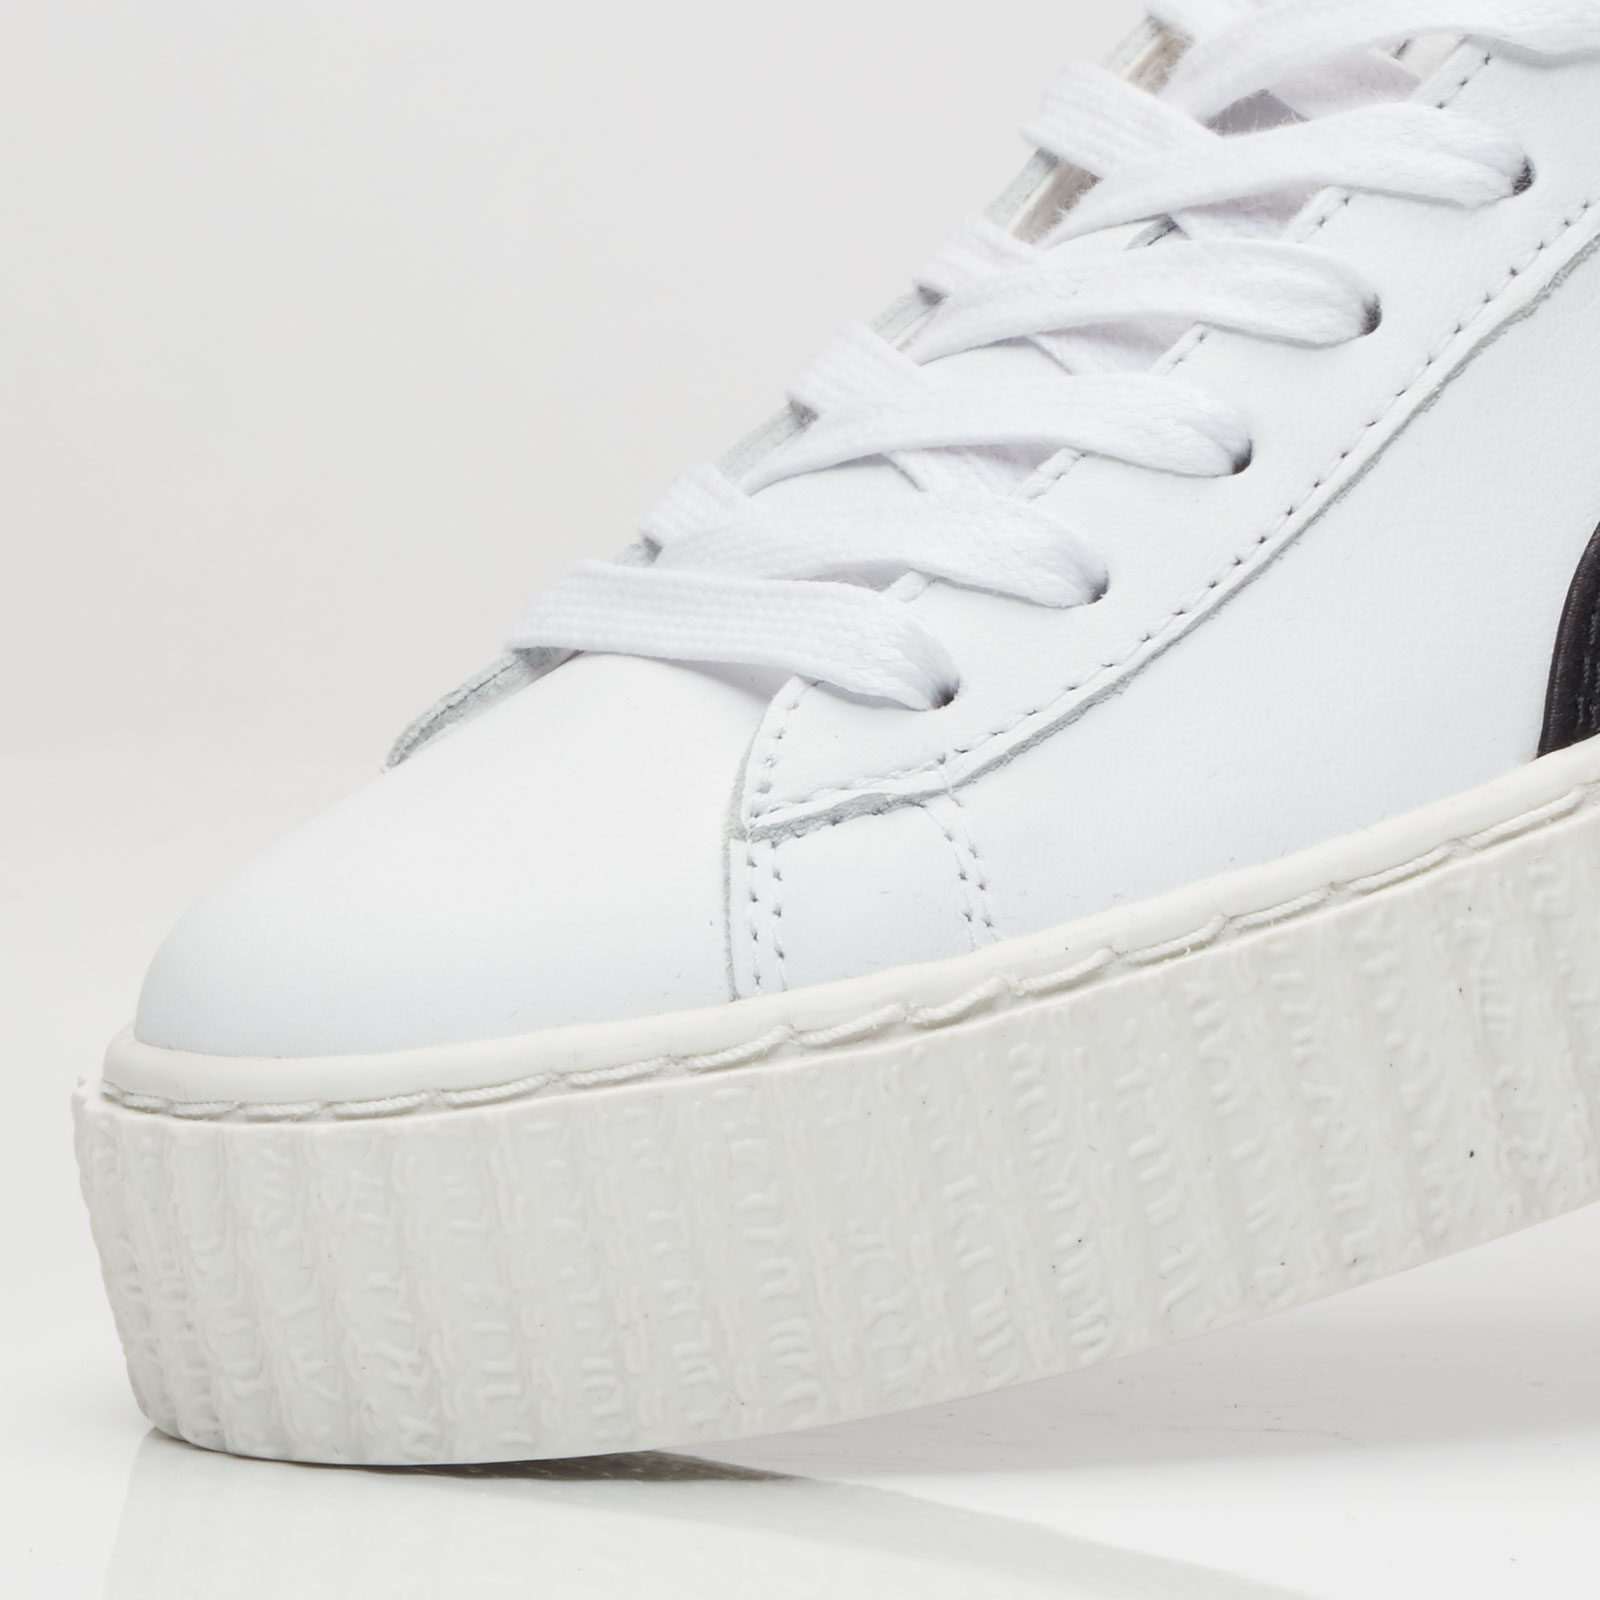 8ce38c6b0ba1 Puma Creeper Cracked Leather - 364462-01 - Sneakersnstuff